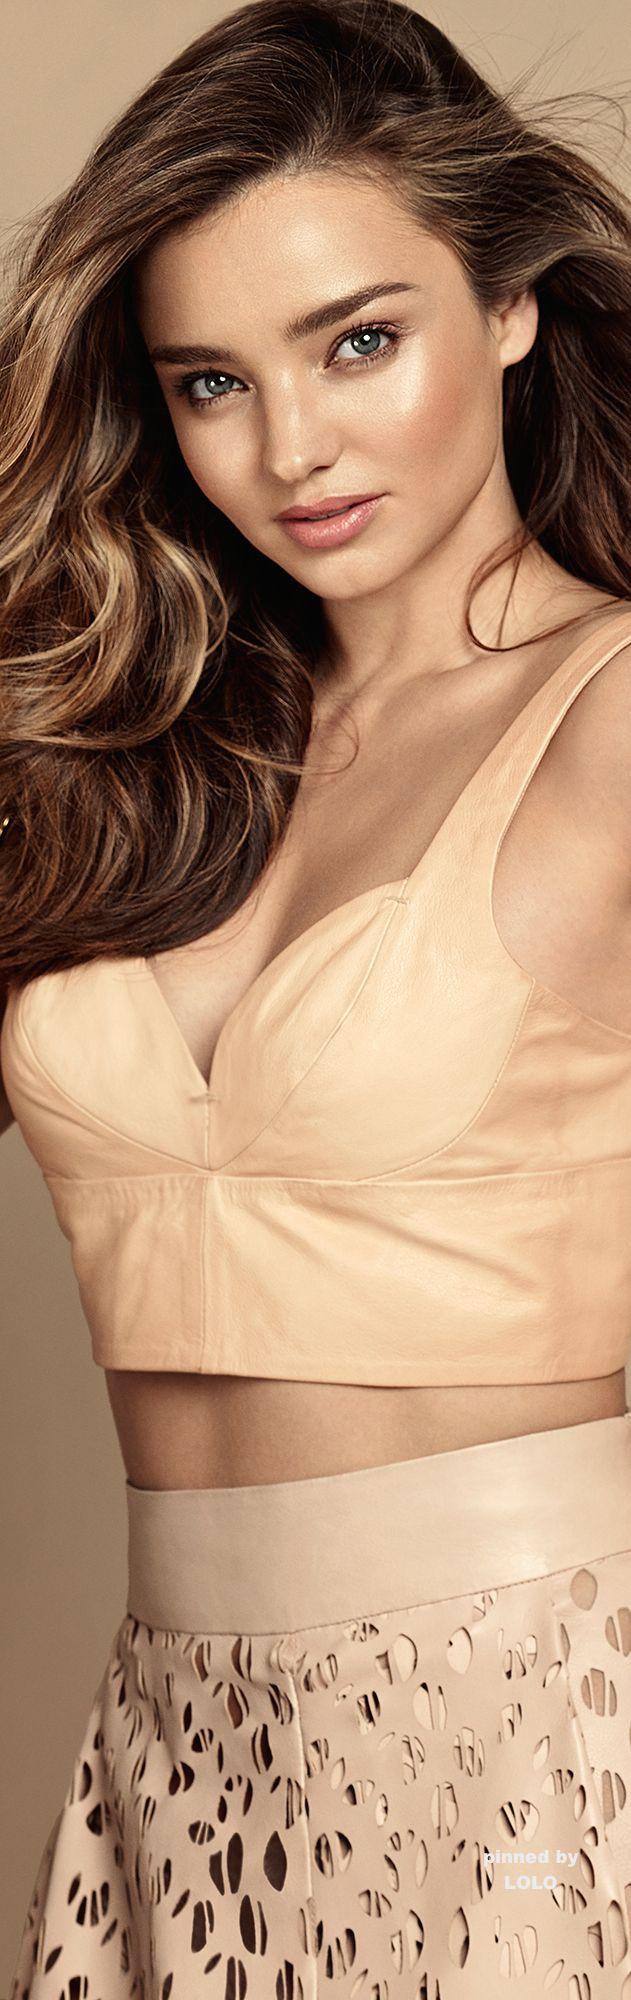 Miranda Kerr | LOLO